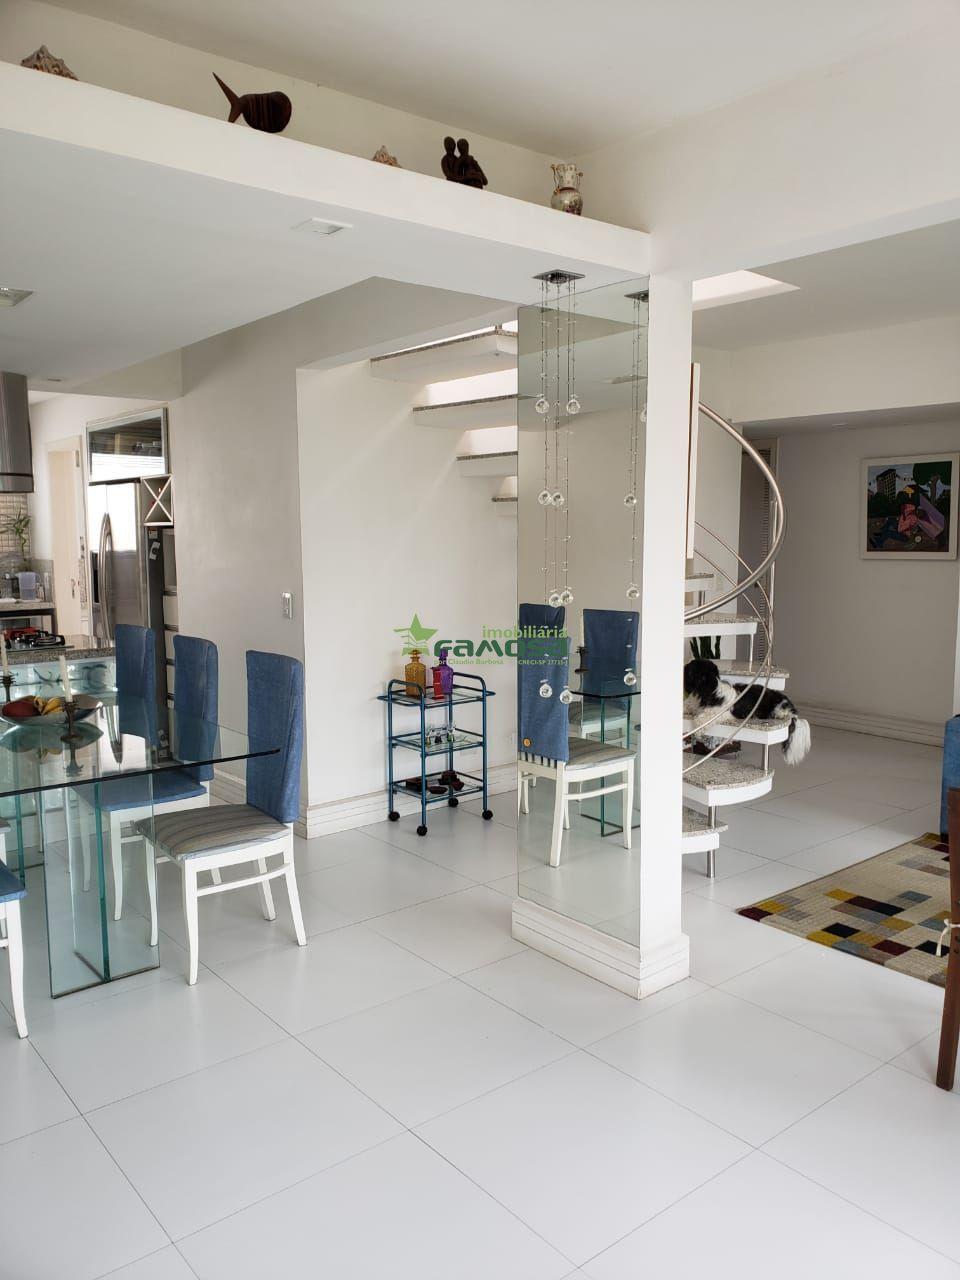 Apartamento à venda  no Jardim Las Palmas - Guarujá, SP. Imóveis